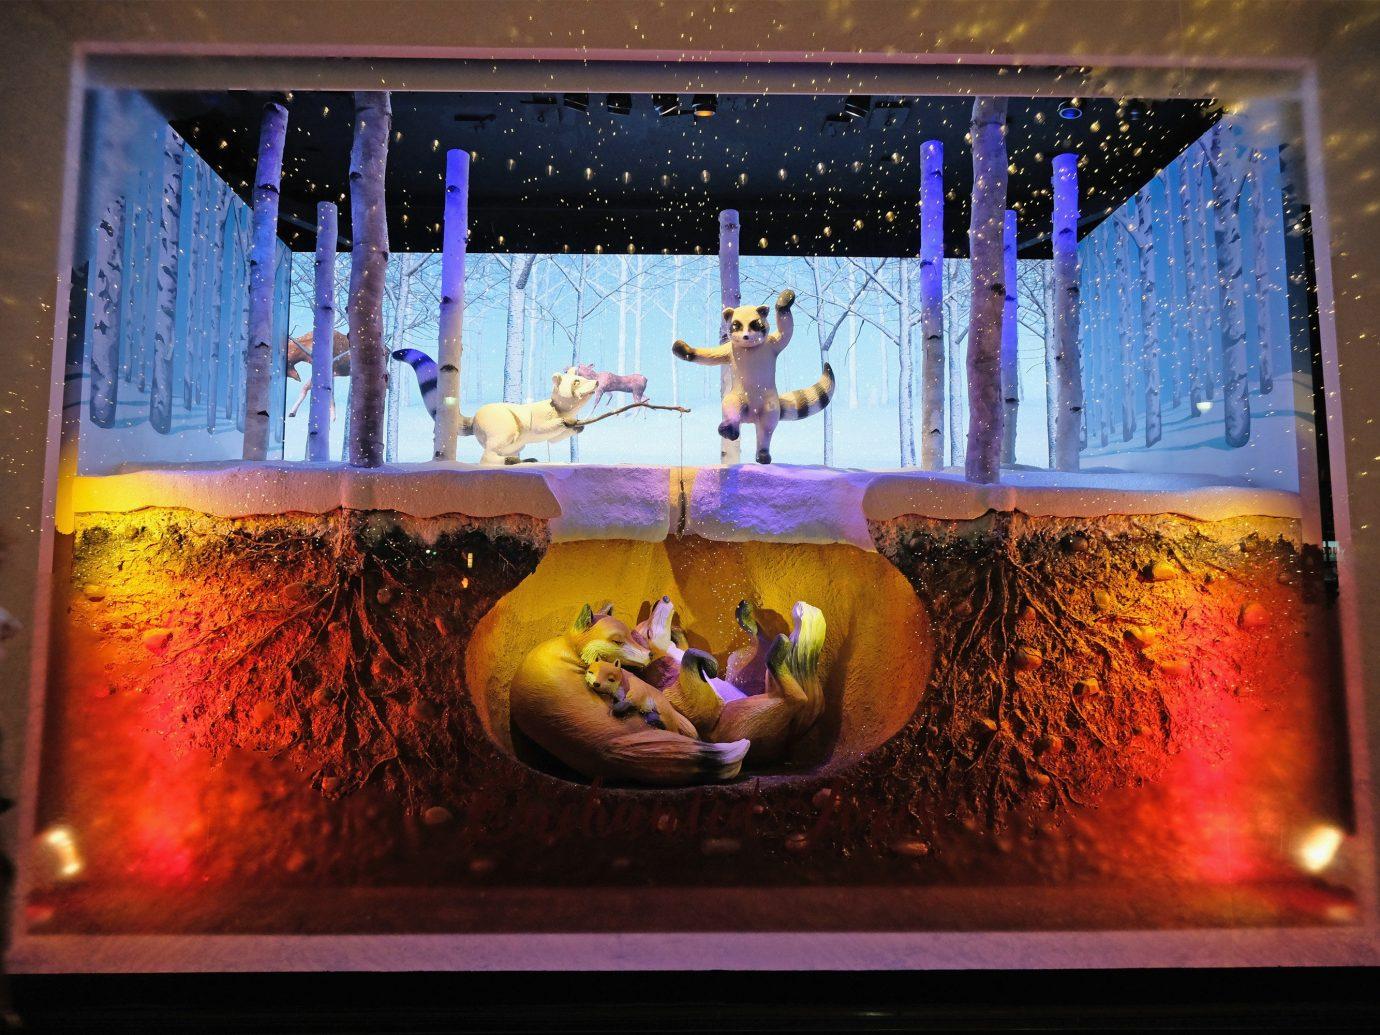 Trip Ideas color indoor light display window lit lighting stage interior design display device glass modern art dark